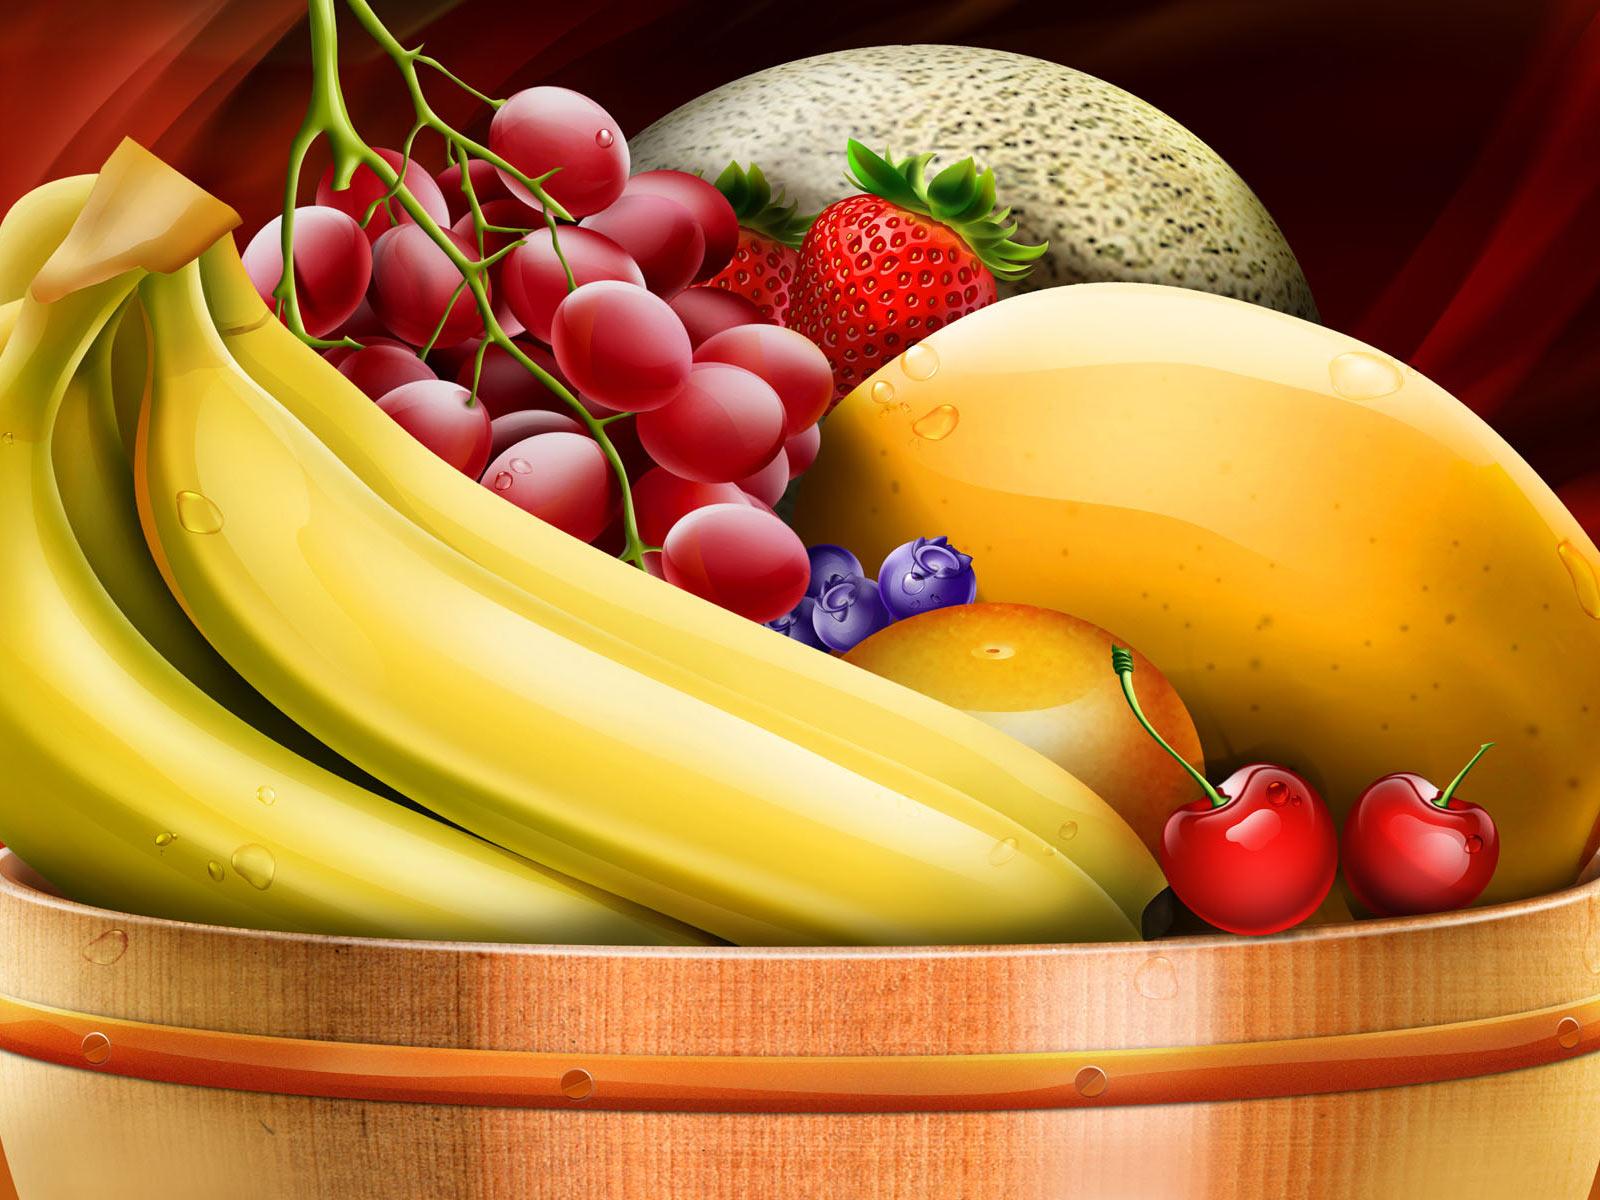 http://3.bp.blogspot.com/-cvylc0XAEaA/TahZkTKwa5I/AAAAAAAAAV0/l7wdoMpUb68/s1600/Bananas%2C_Mango%2C_Grape%2C_Cherry%2C_Melon.jpg